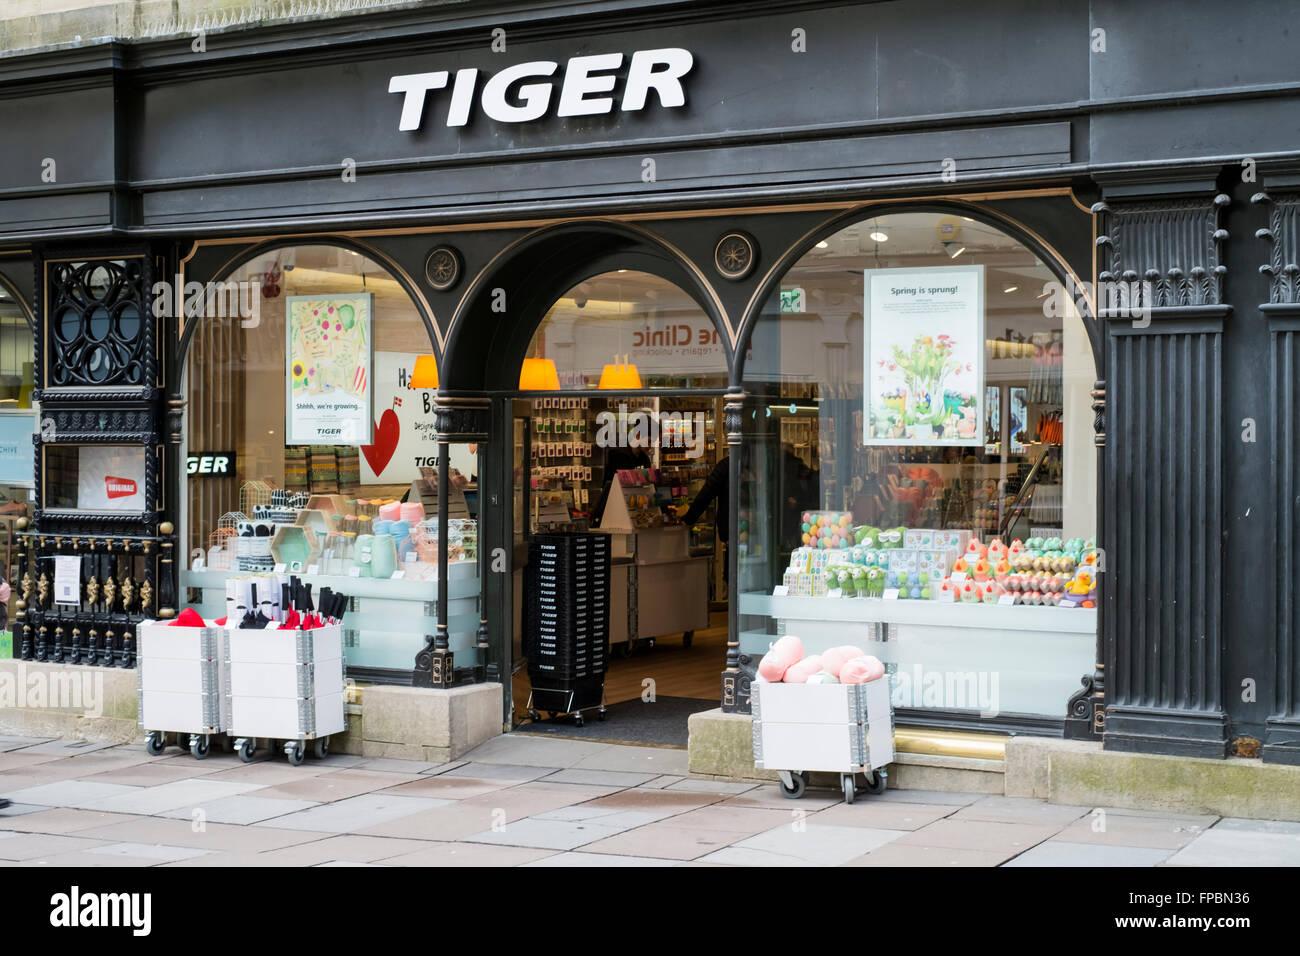 City of Bath England Tiger gift shop Stock Photo: 99832298 - Alamy